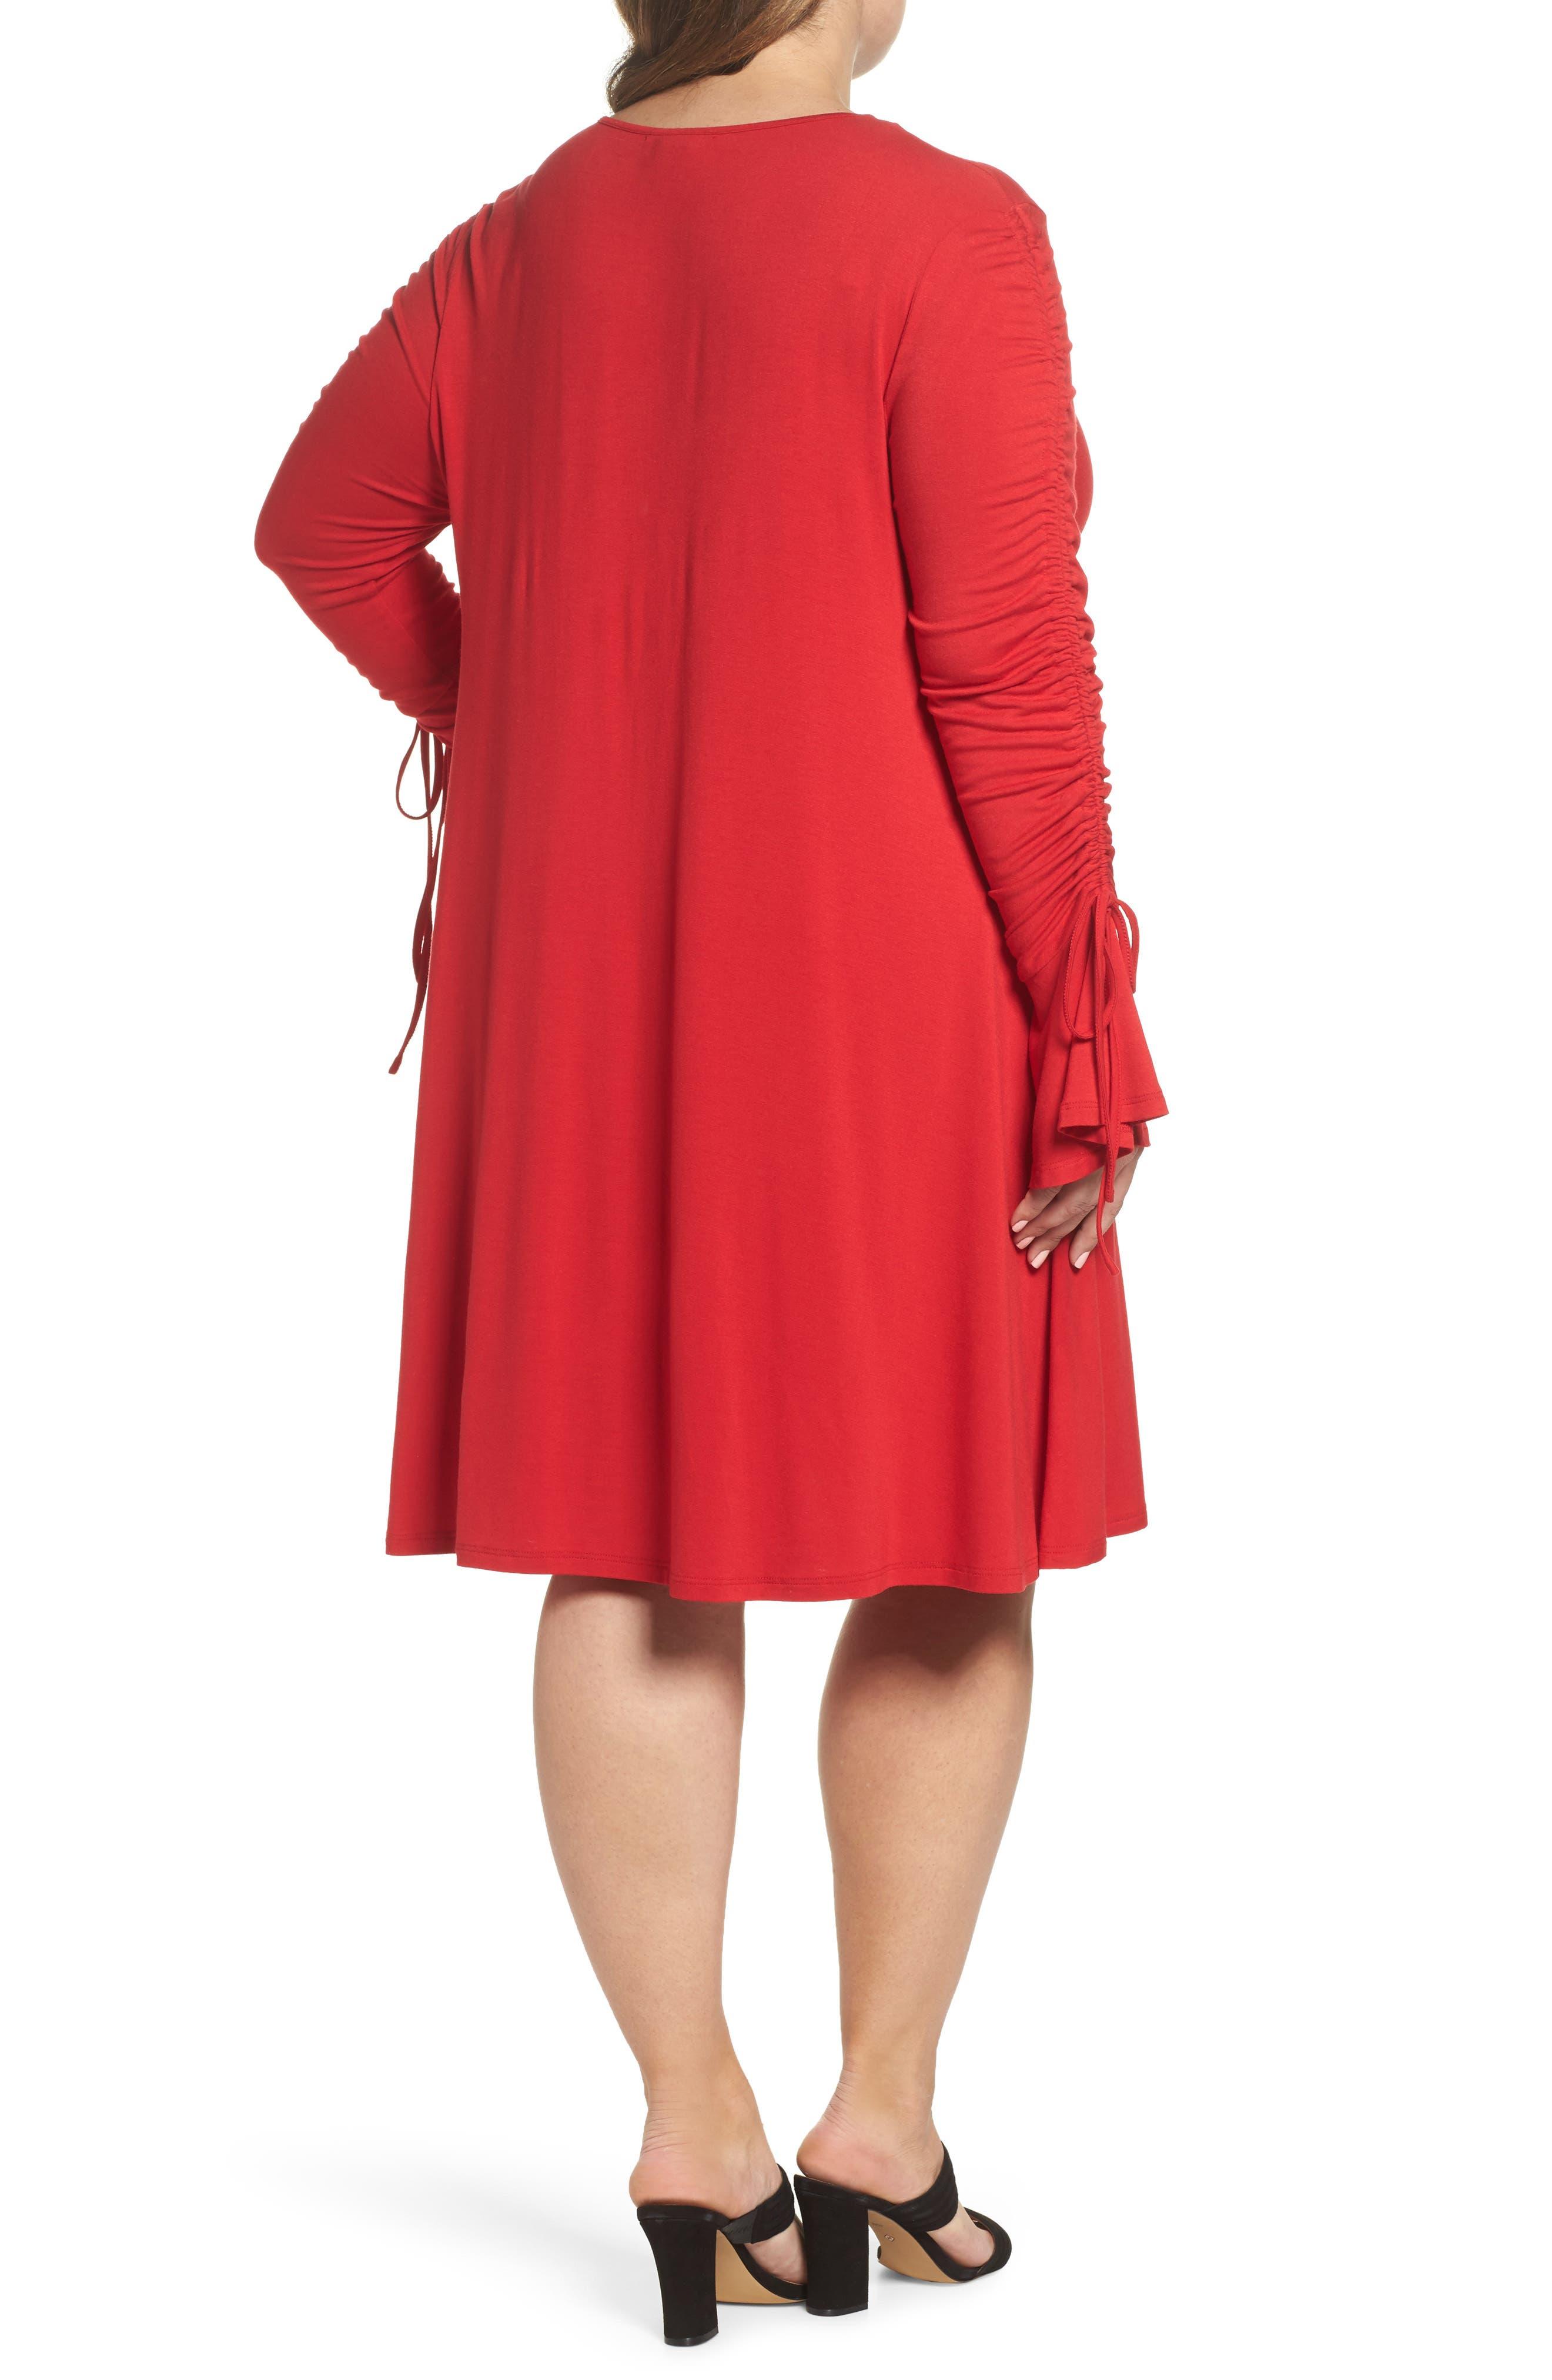 Tulip Sleeve Shift Dress,                             Alternate thumbnail 2, color,                             Red